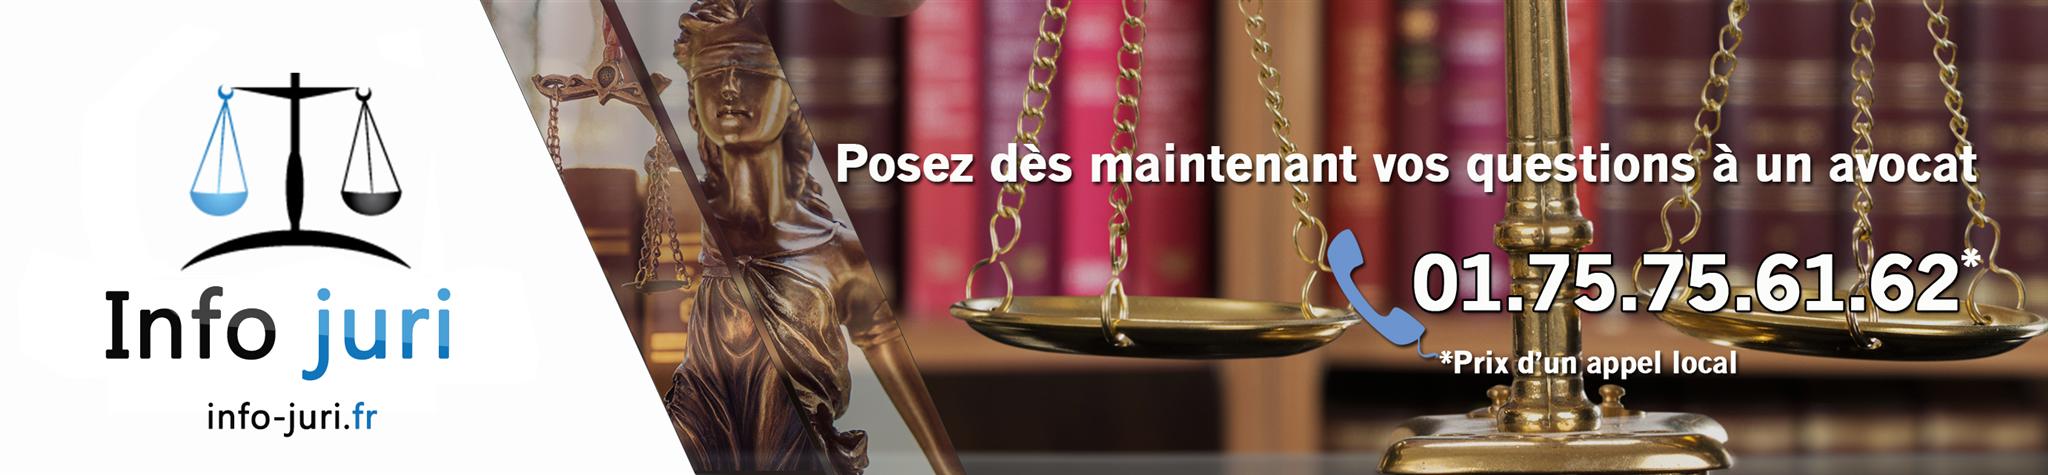 Info-juri.fr